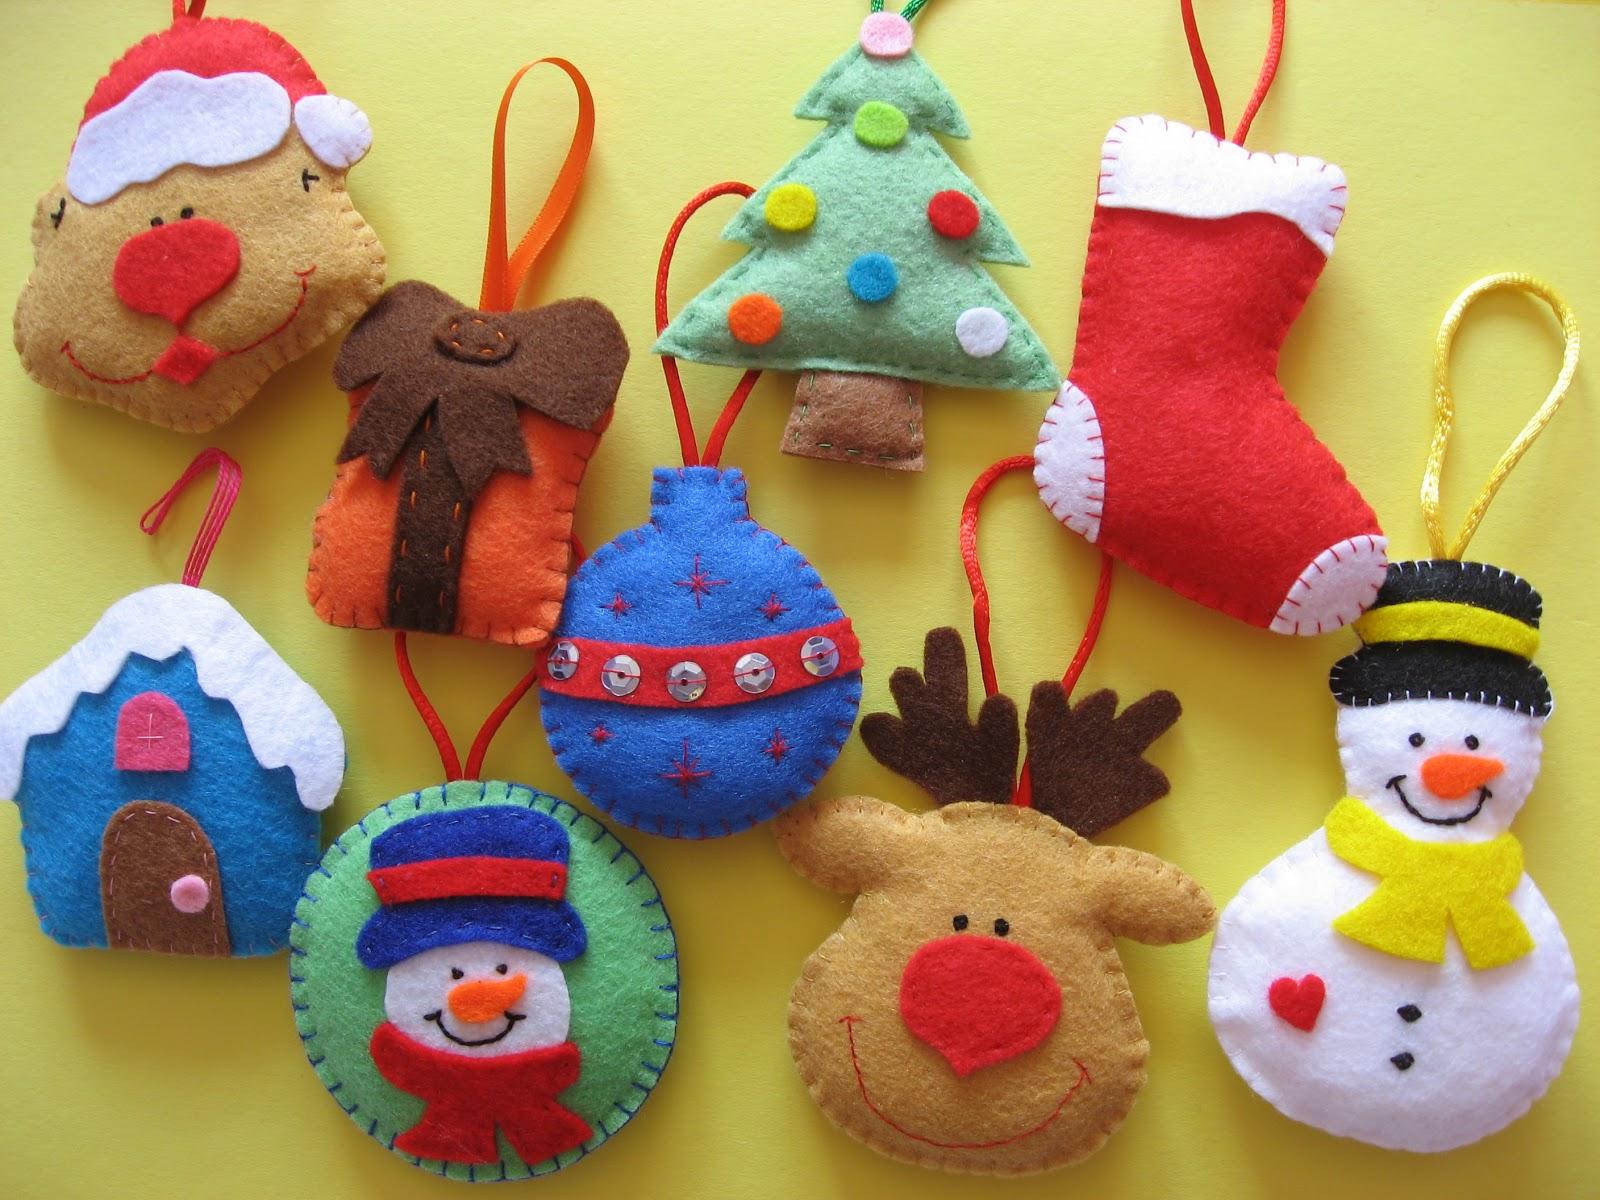 Lucky s felt adornos de navidad for Adornos navidenos para el arbol